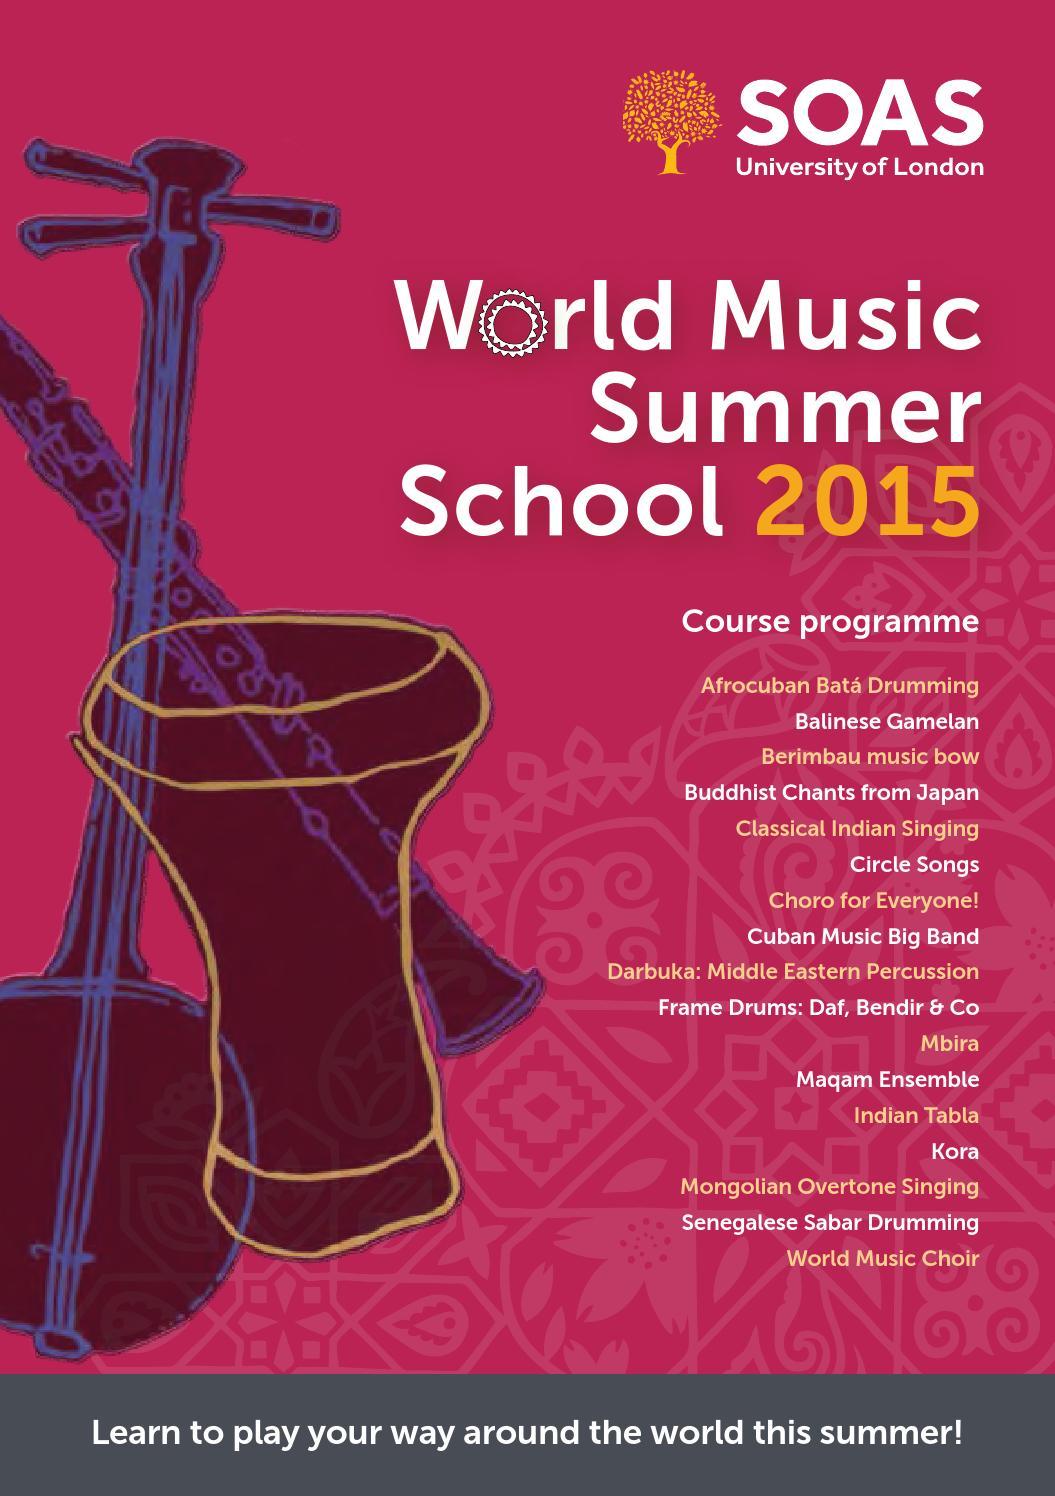 SOAS Music Summer School 2015 Brochure by SOAS Summer School